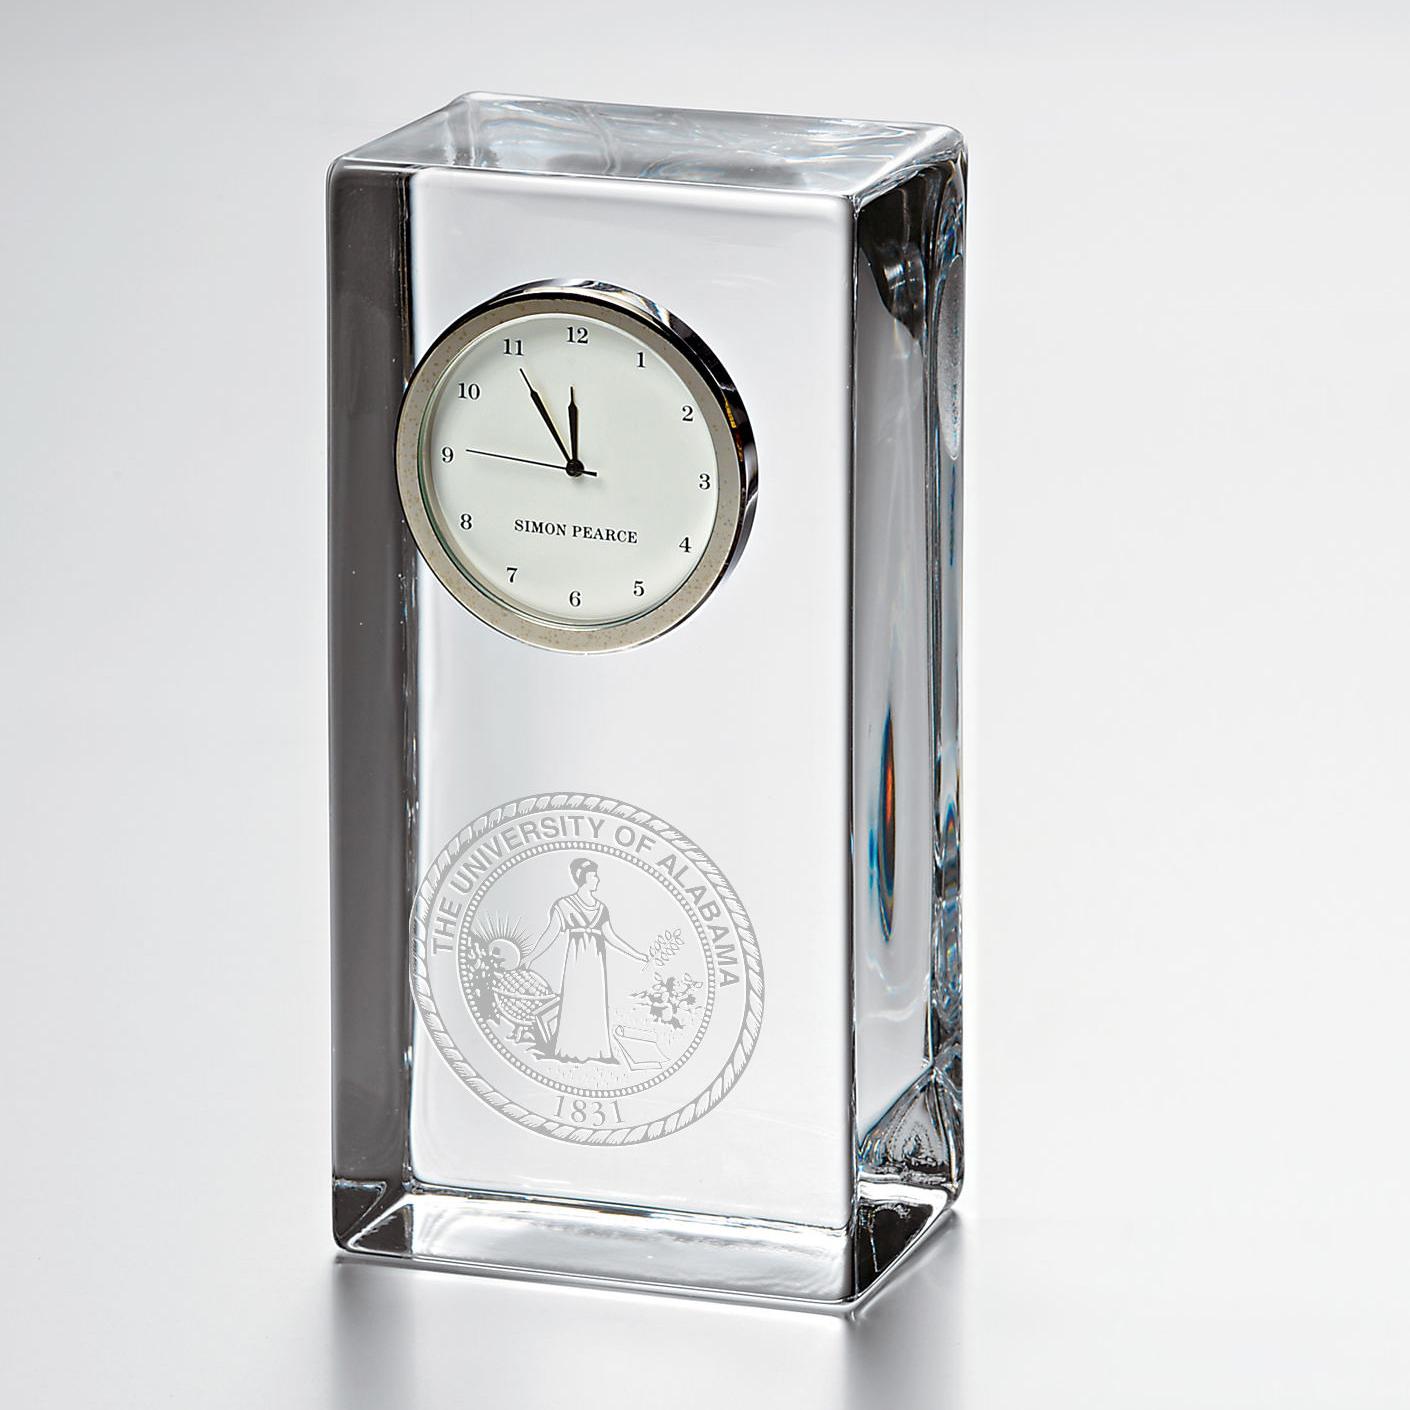 Alabama Tall Desk Clock by Simon Pearce